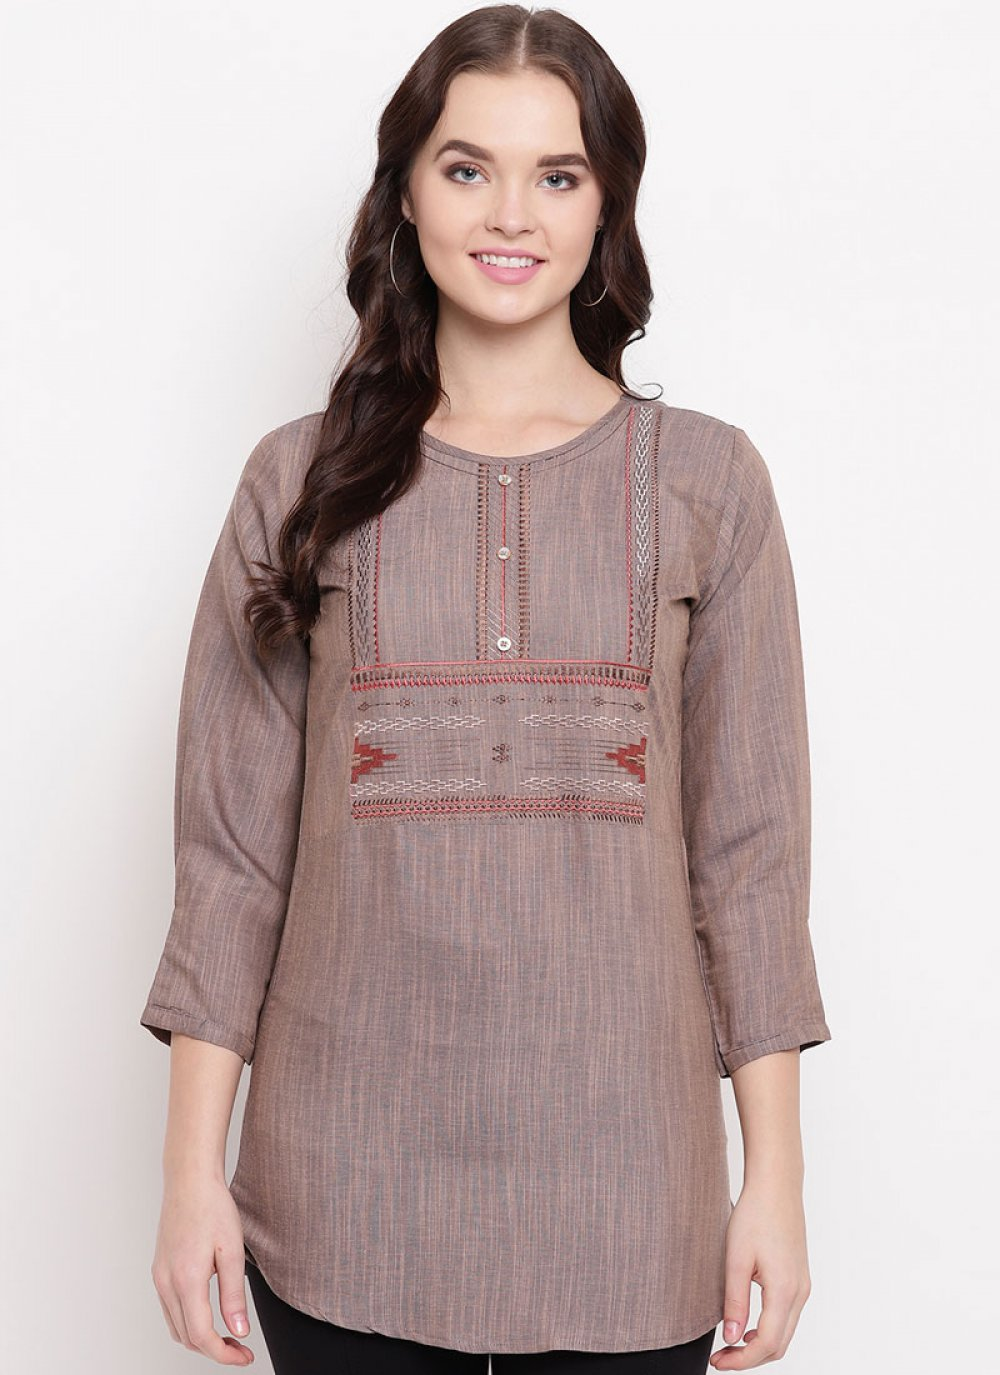 Cotton Party Wear Kurti in Brown